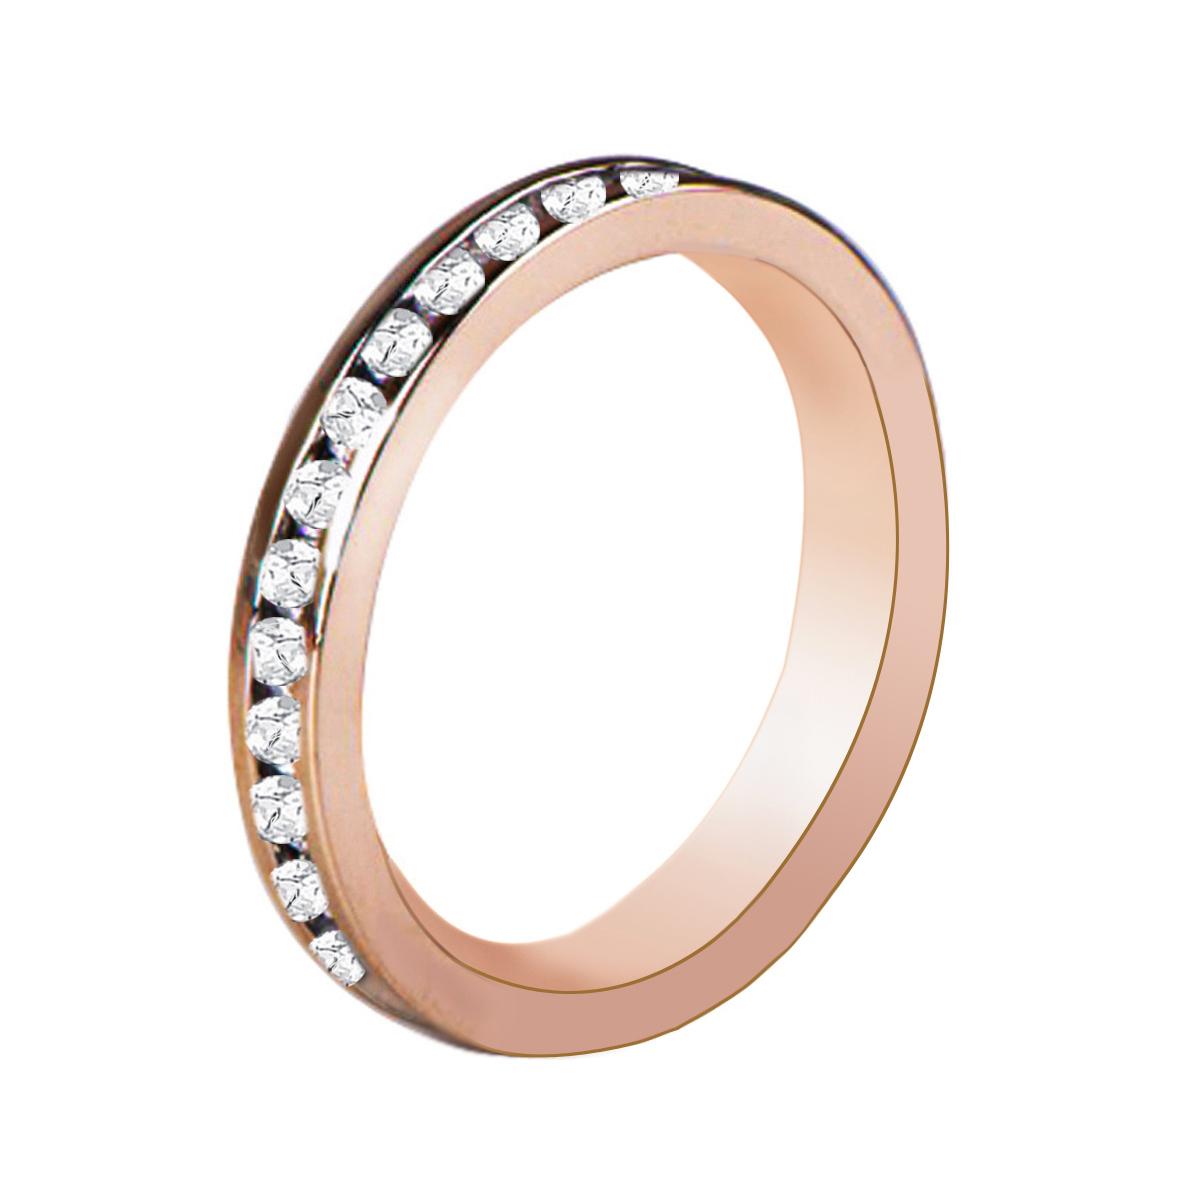 Titanium full rhinestone lovers ring jewelry small accessories finger ring birthday gift lettering(China (Mainland))